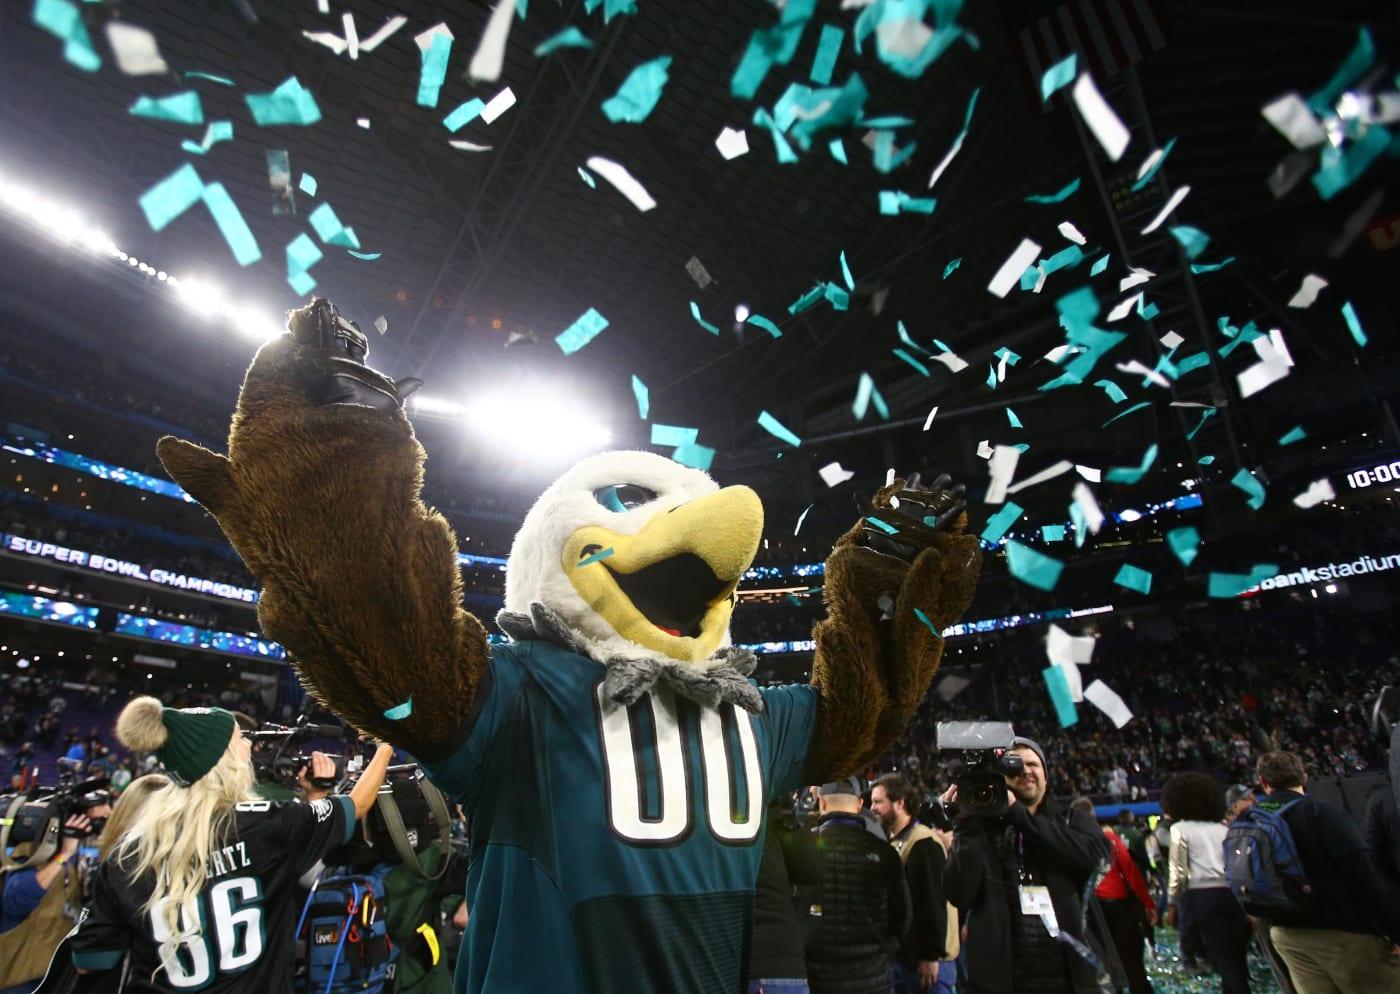 Philadelphia Eagle Mascot Super Bowl LII 2018